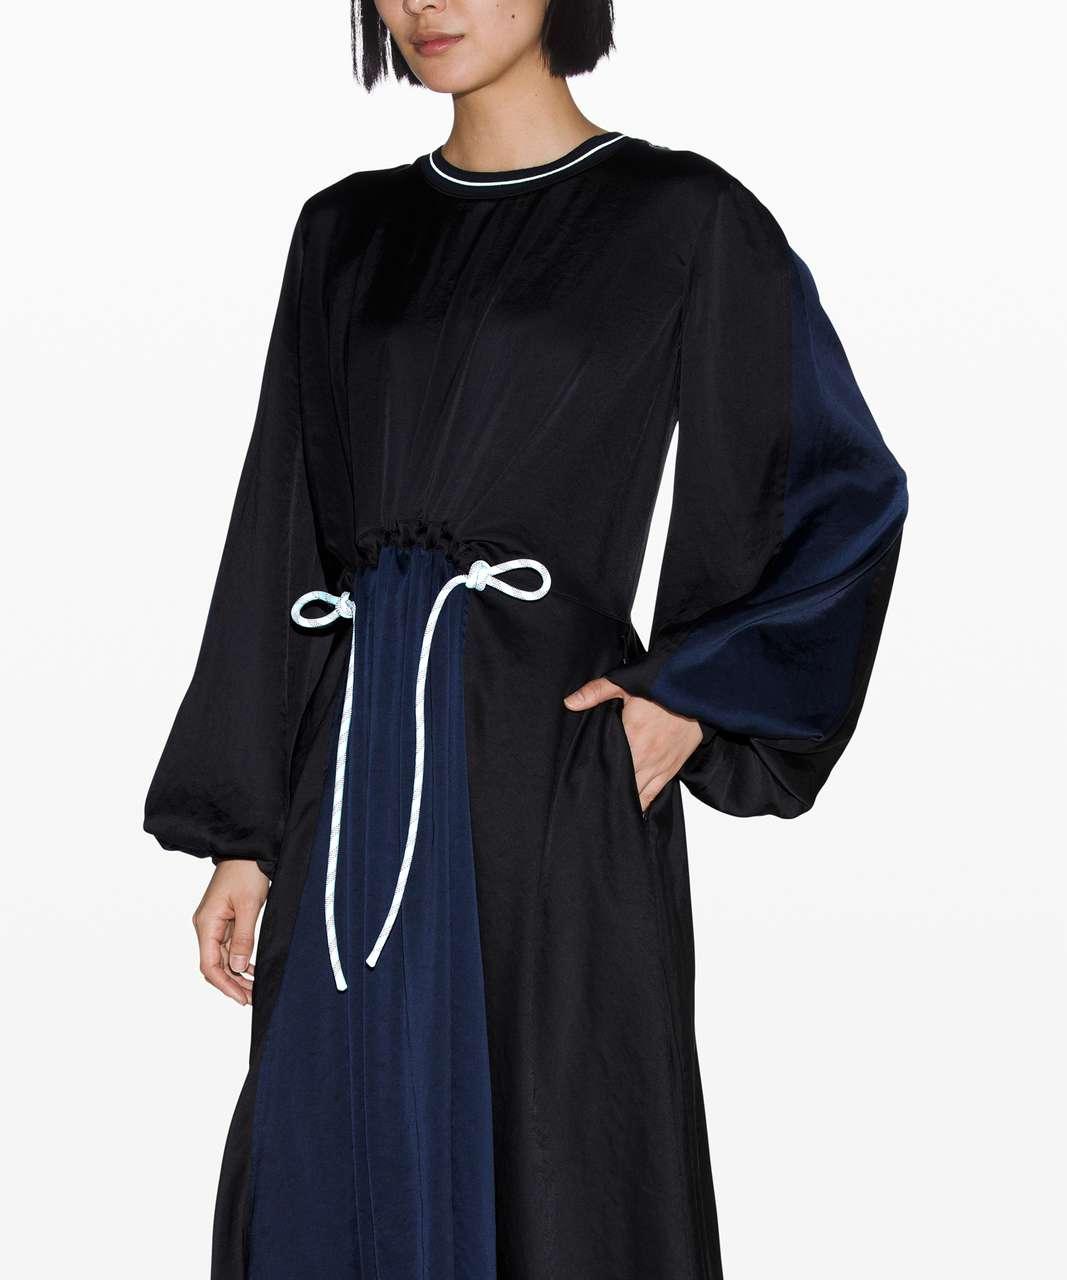 Lululemon Face Forward Dress *lululemon x Roksanda - Black / True Navy